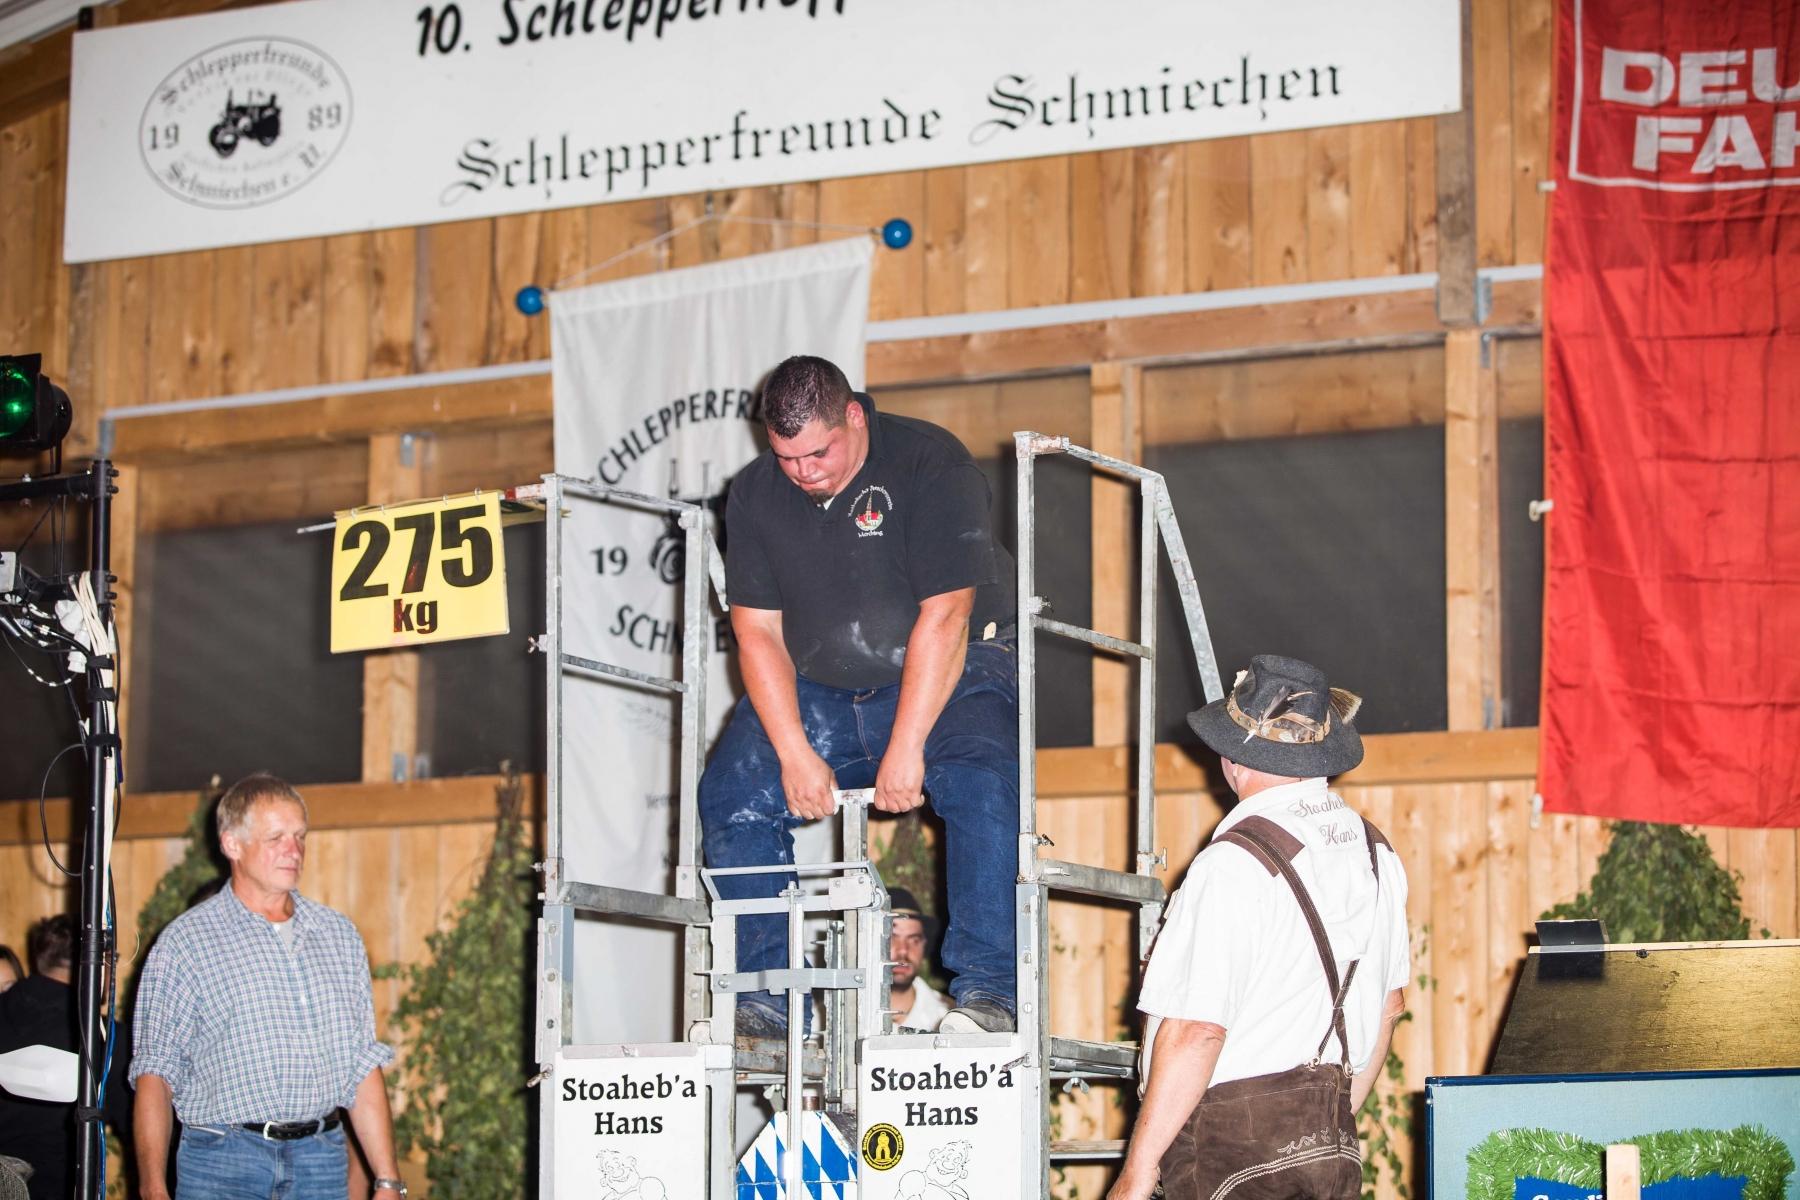 150911_Schmiechen_Schleppertreffen_153